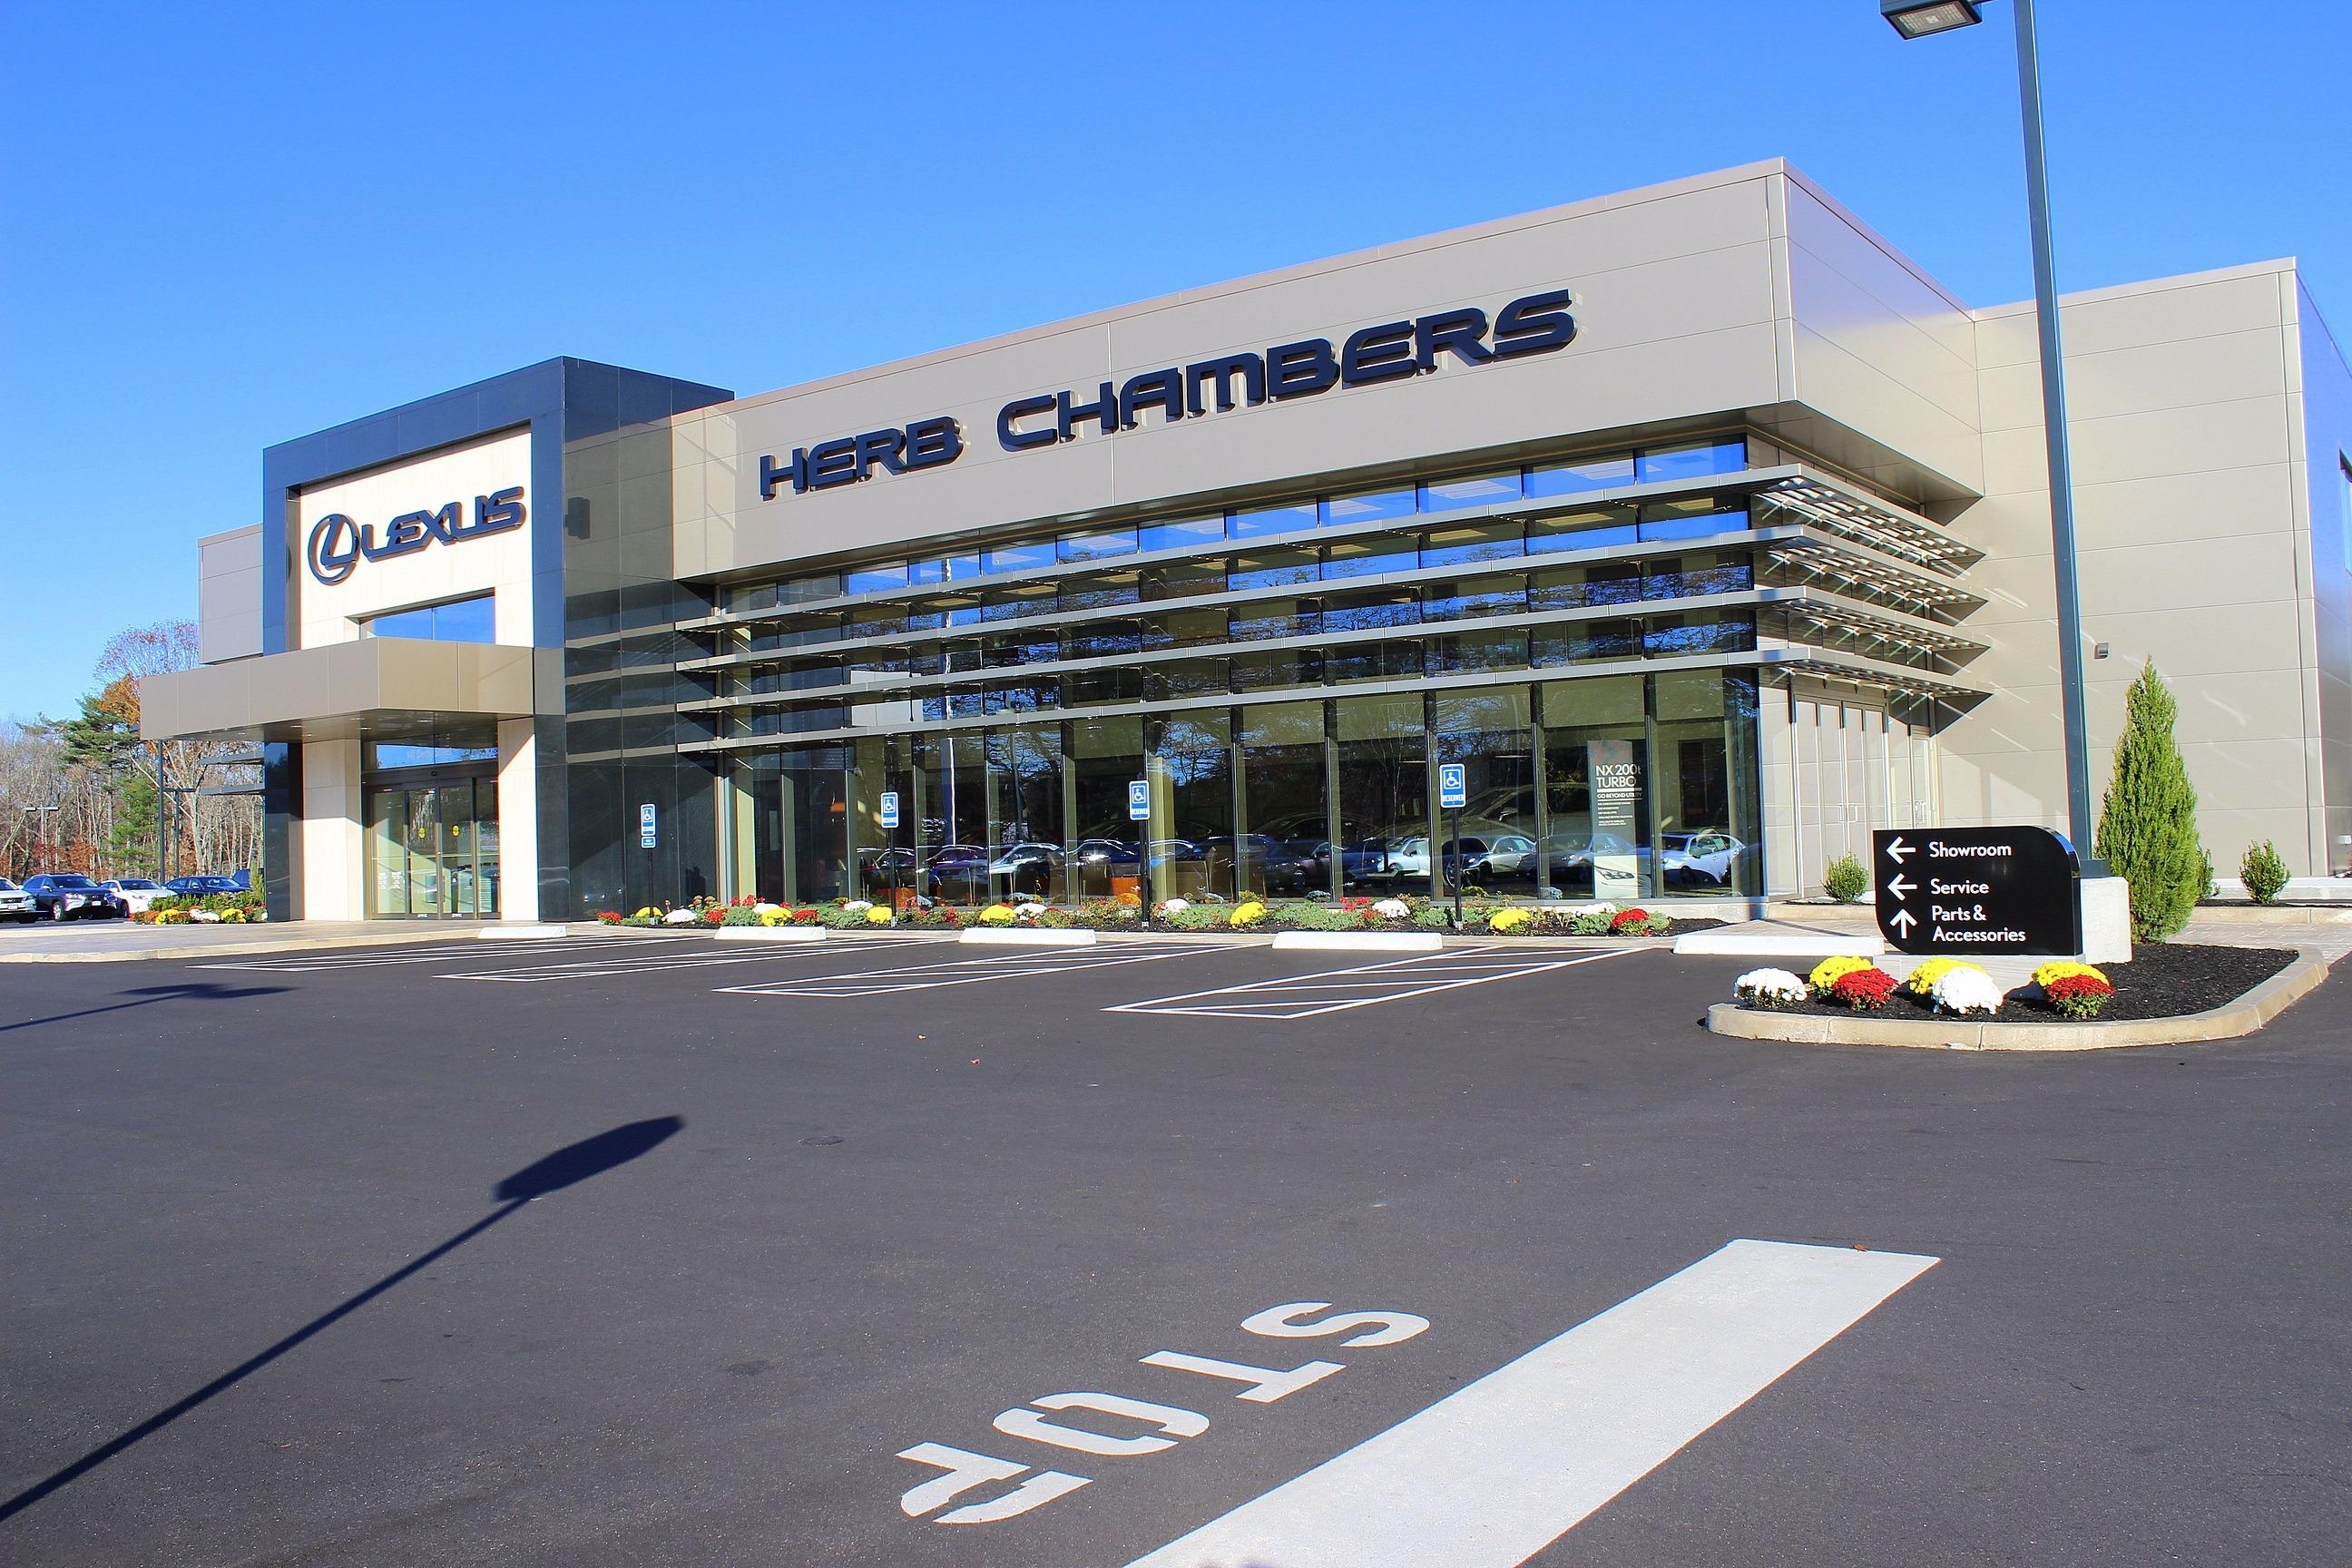 Los Angeles Lexus Service Coupons >> Herb Chambers Lexus of Hingham Coupons near me in Hingham ...